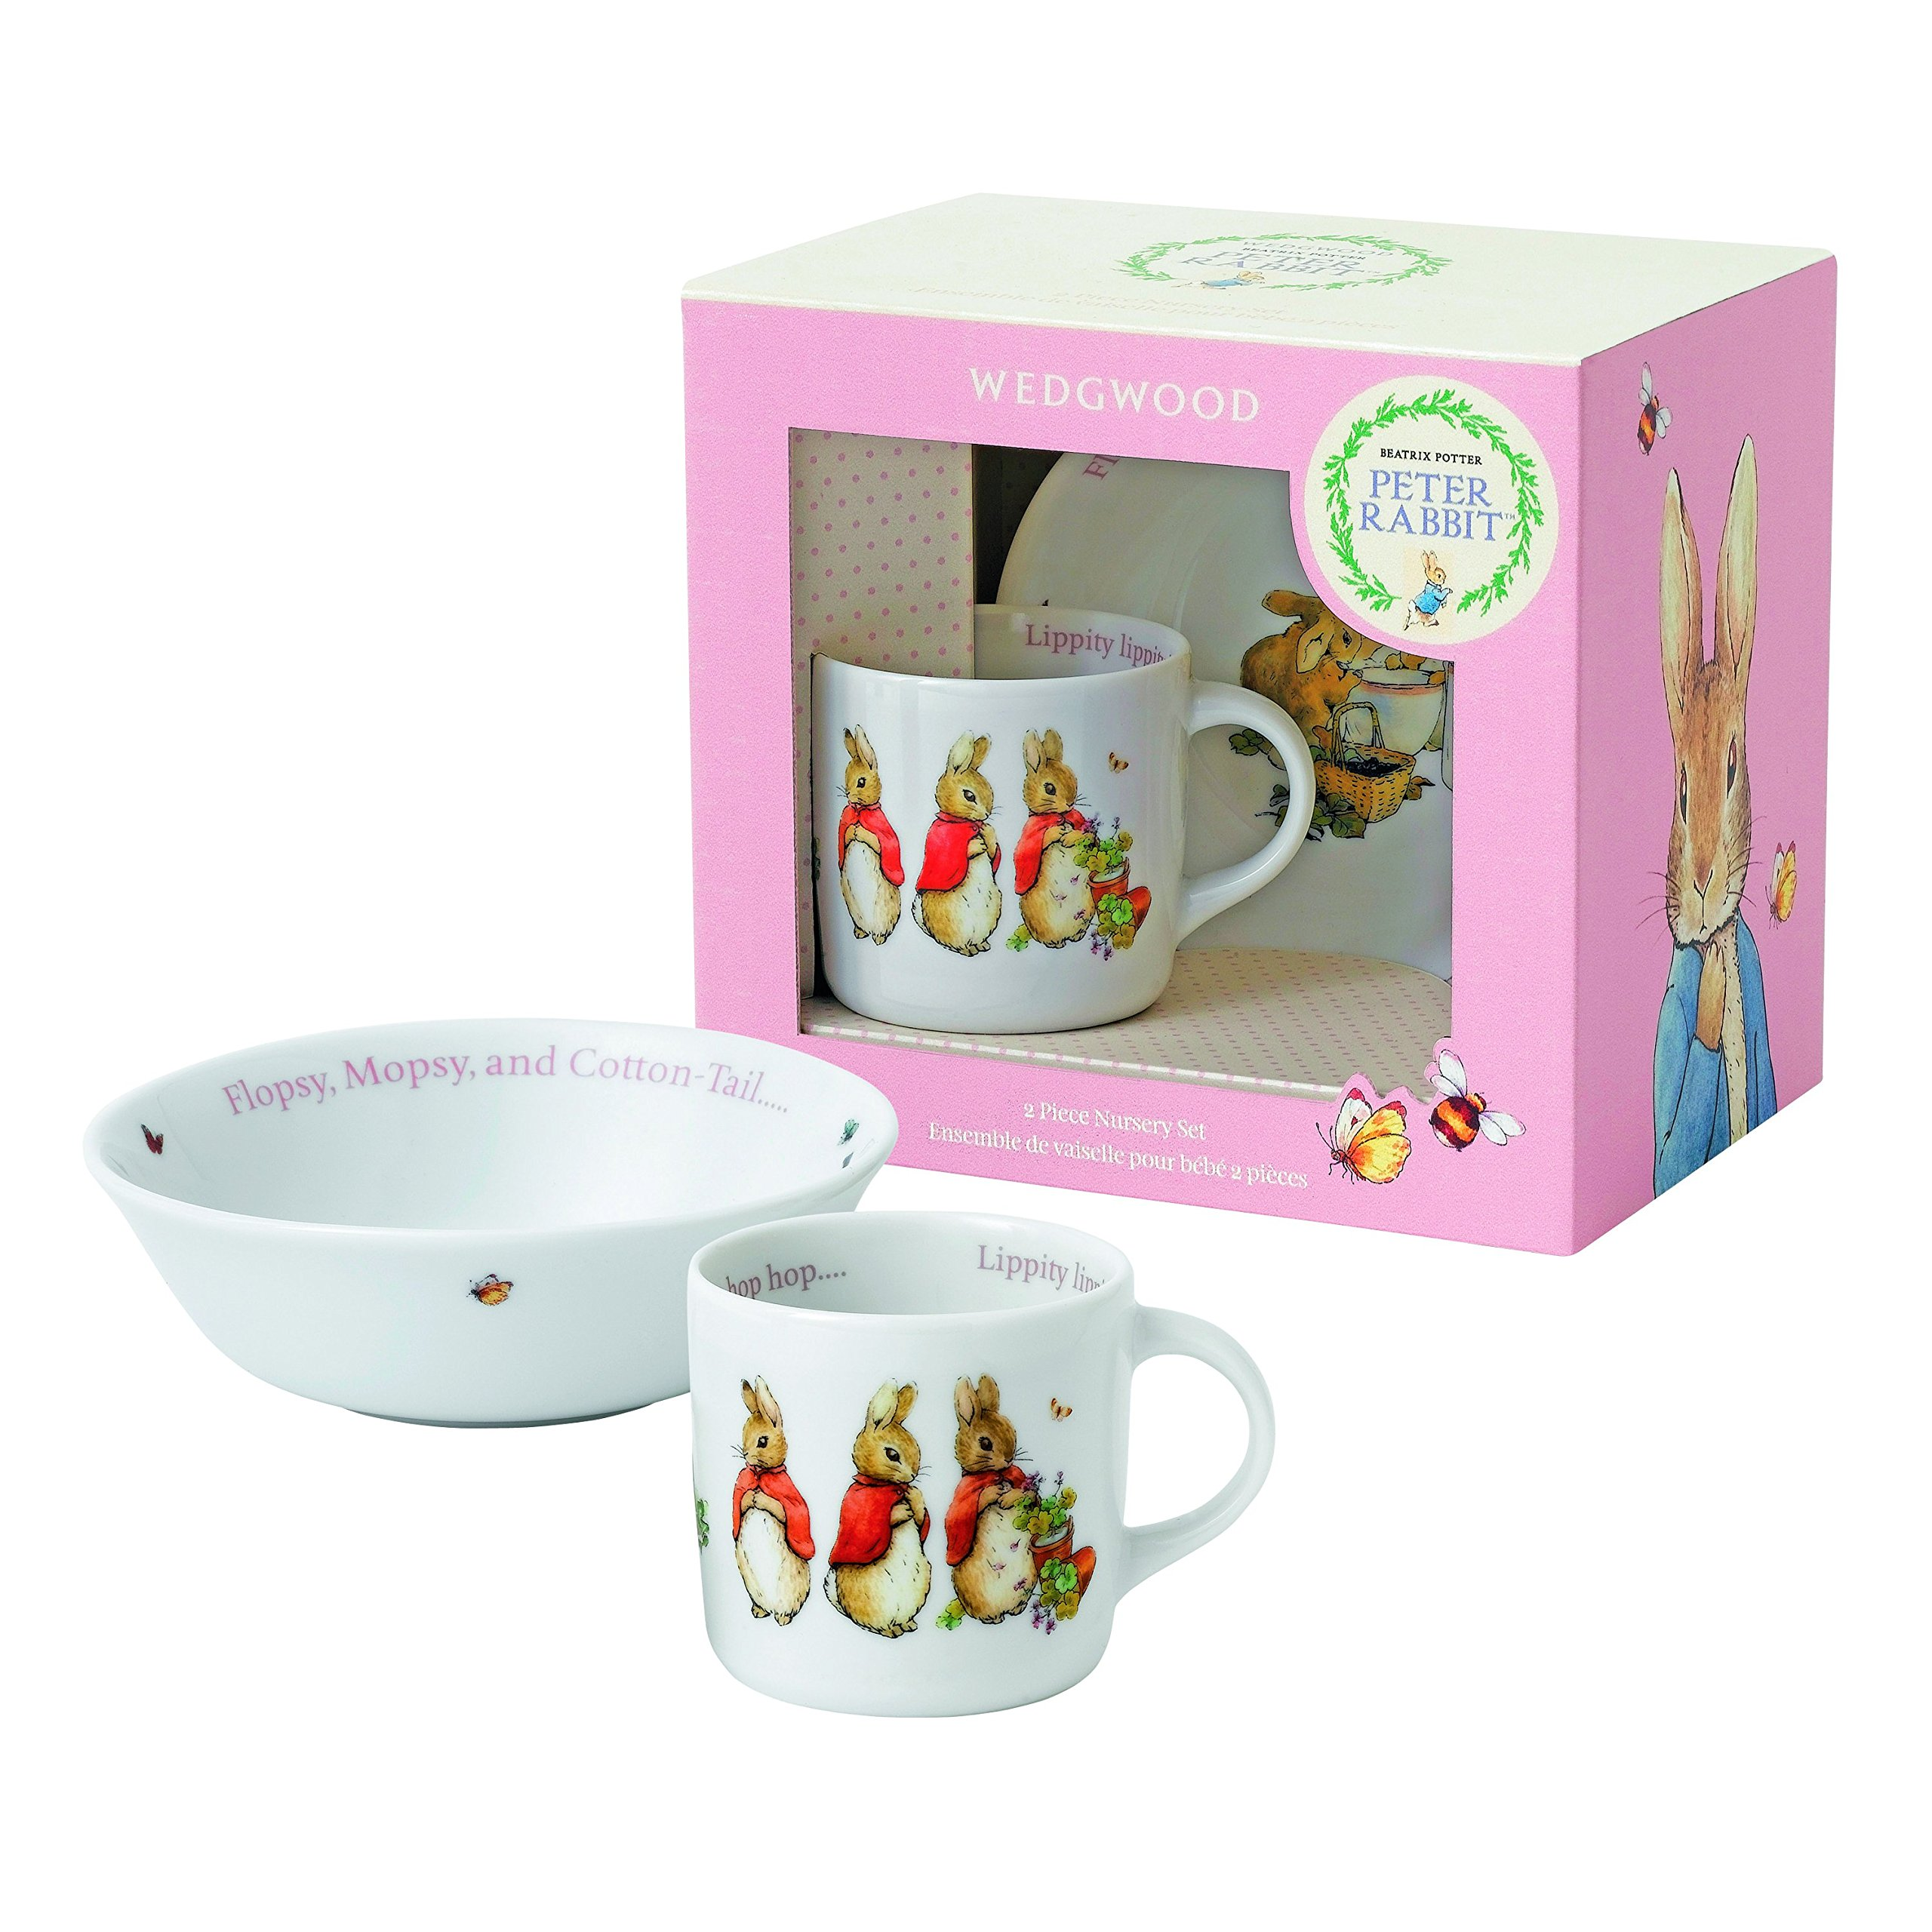 Wedgwood Girl's Peter Rabbit 2-Piece Bowl and Mug Set, White and Pink